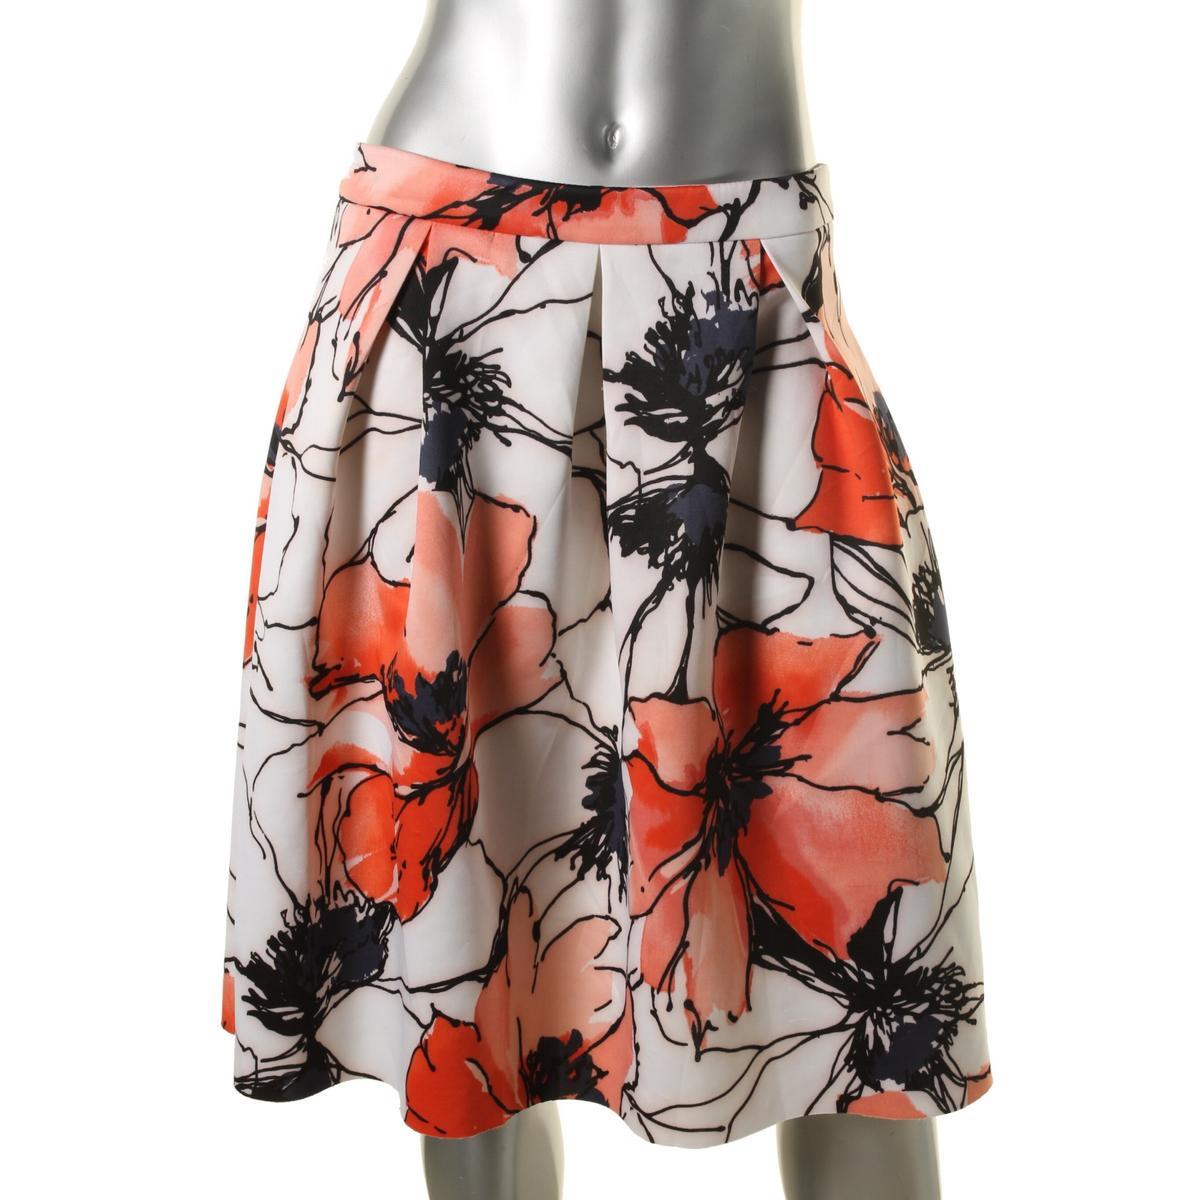 Aqua-7868-Womens-Red-Floral-Print-Pleated-Neoprene-A-Line-Skirt-L-BHFO